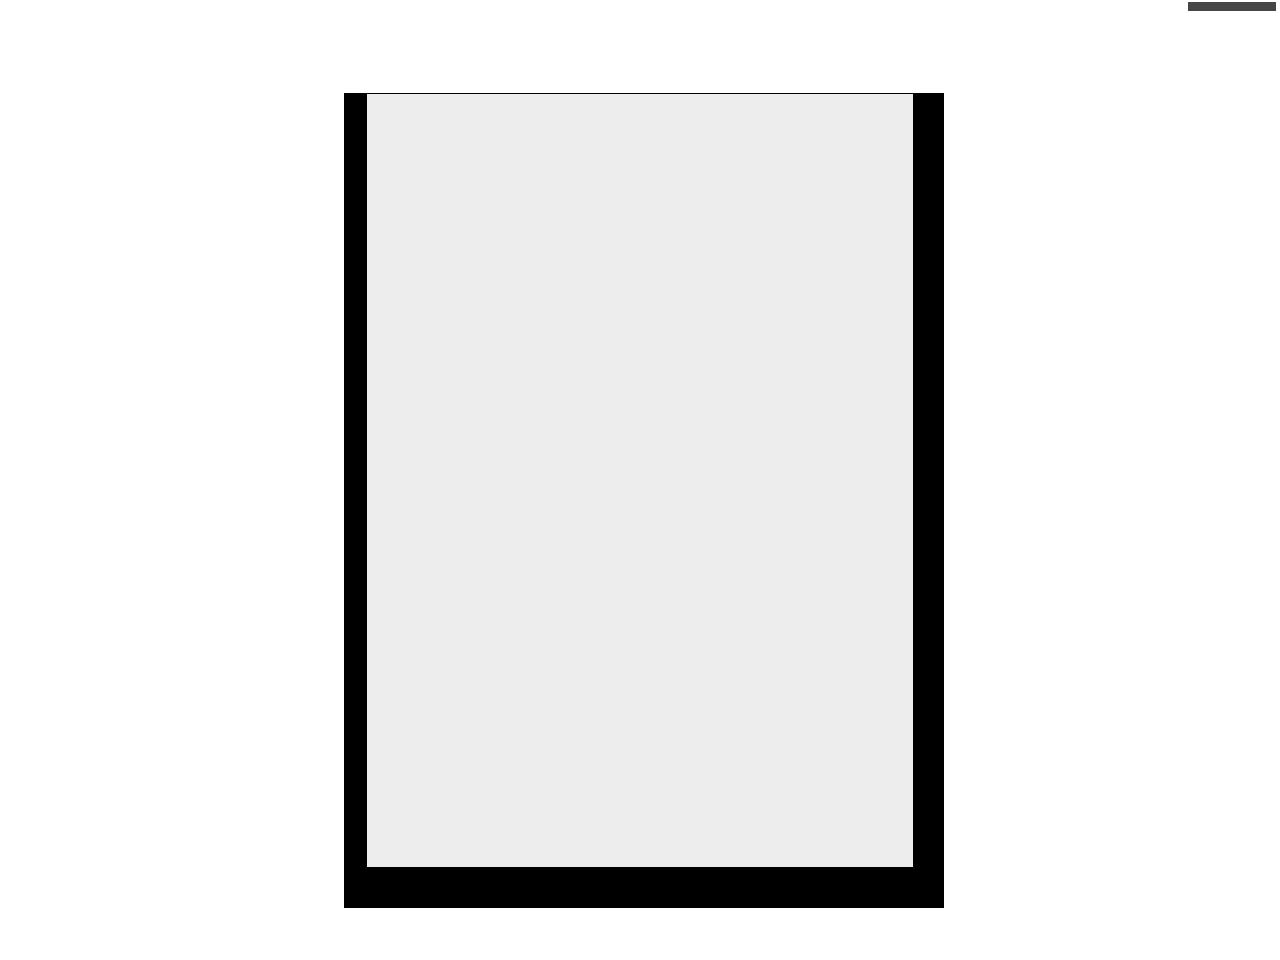 Blank Paper Background Paper Free Paper Mockup Transparent Paper